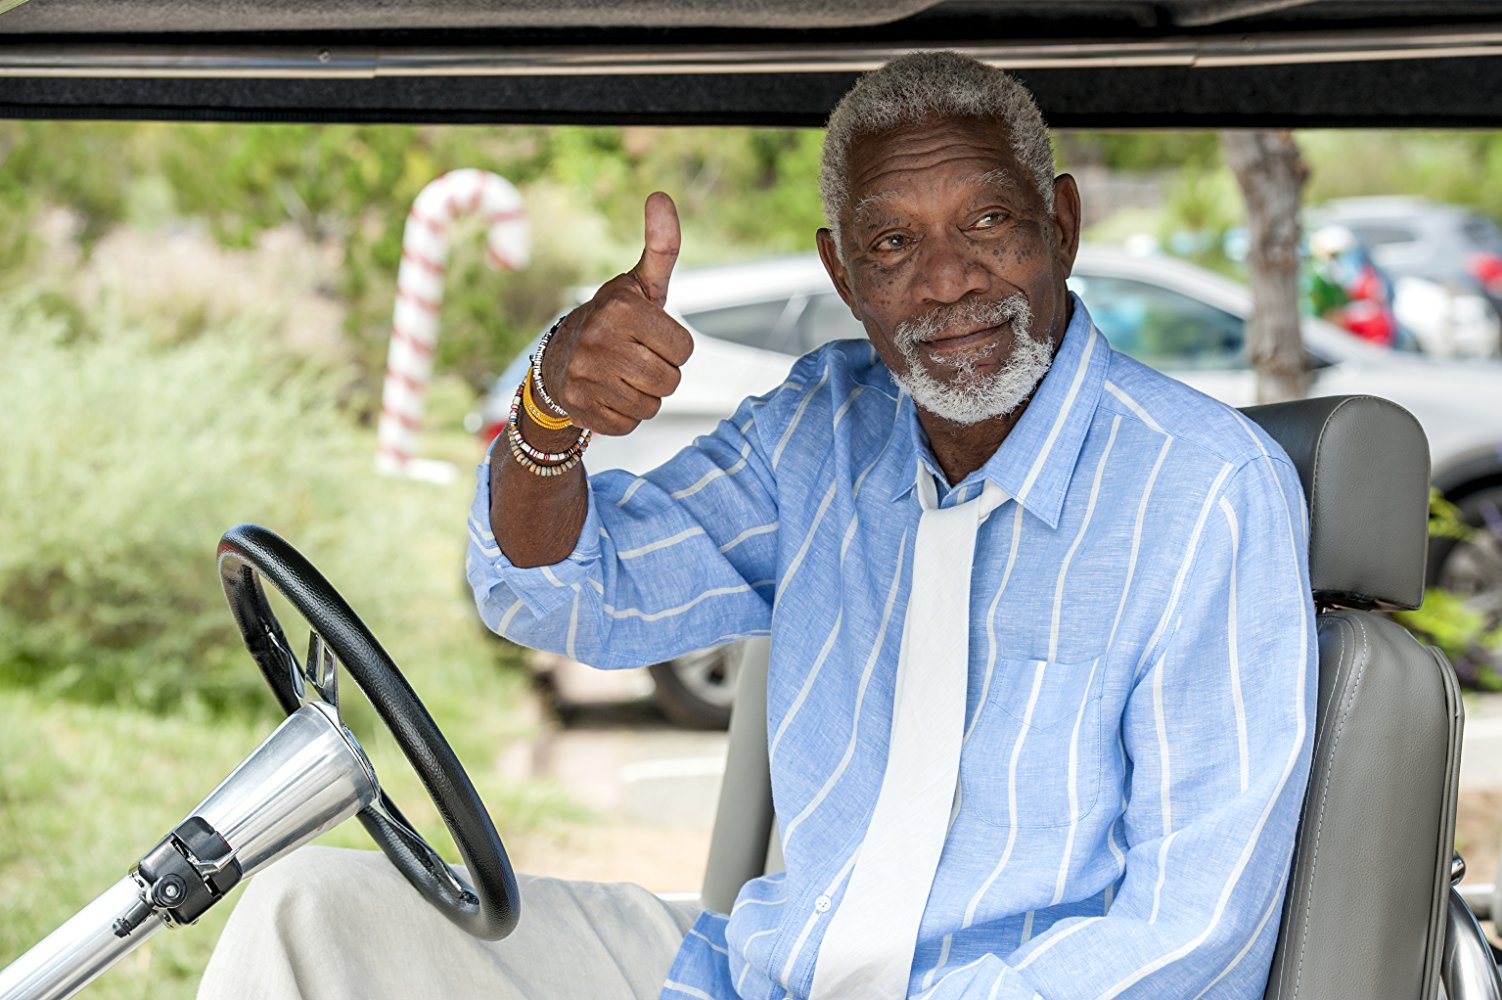 Morgan Freeman accusé de harcèlement sexuel par CNN